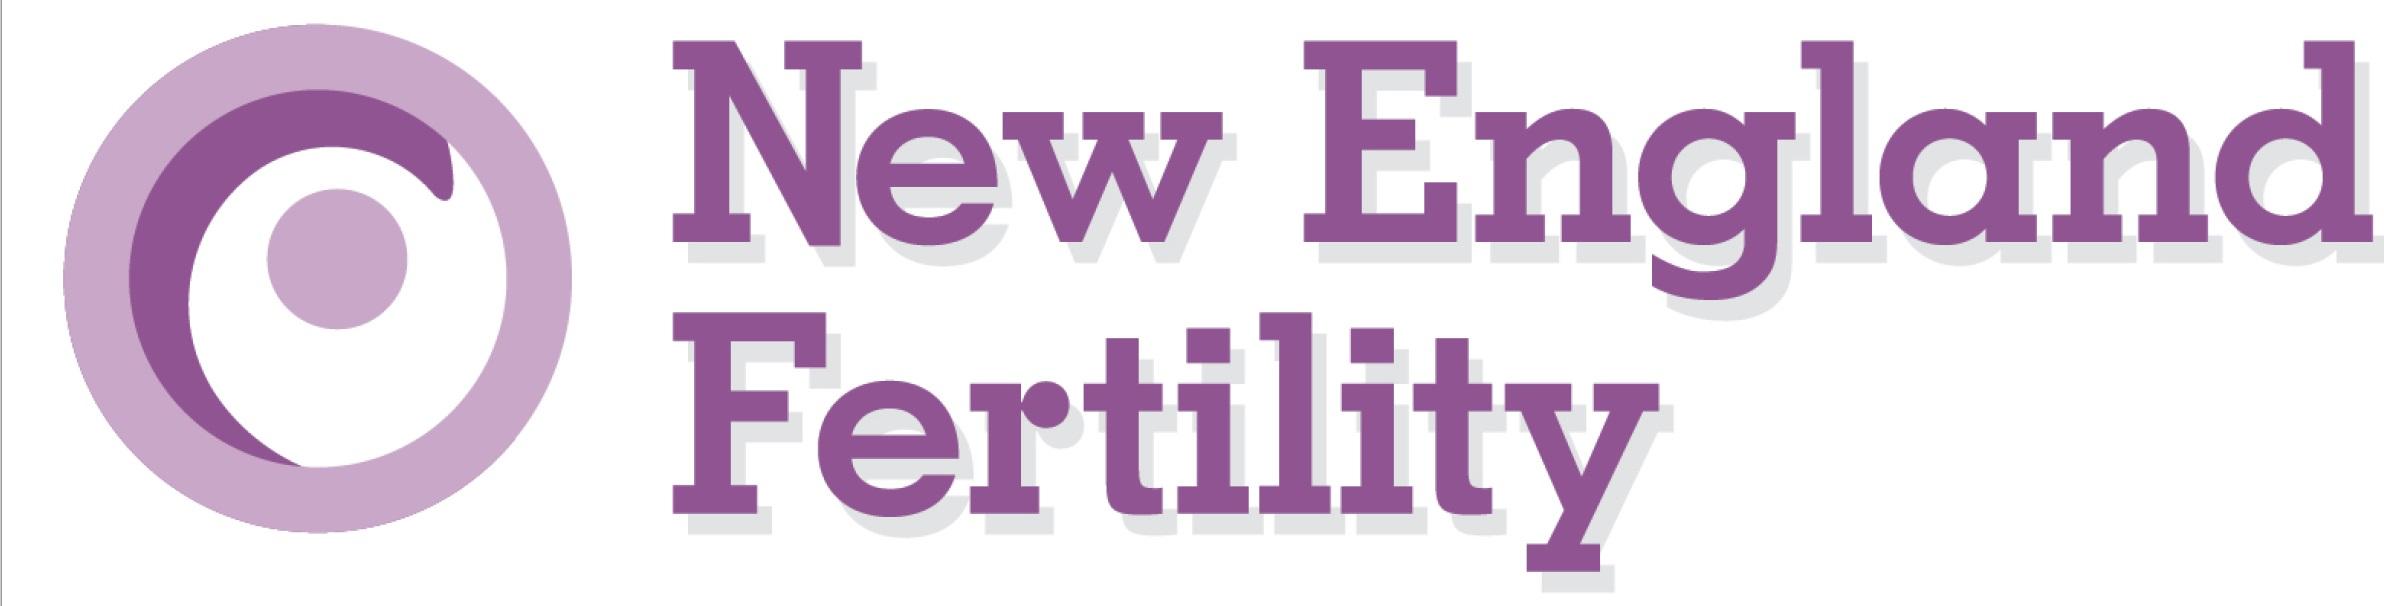 NE_Fertility.jpg